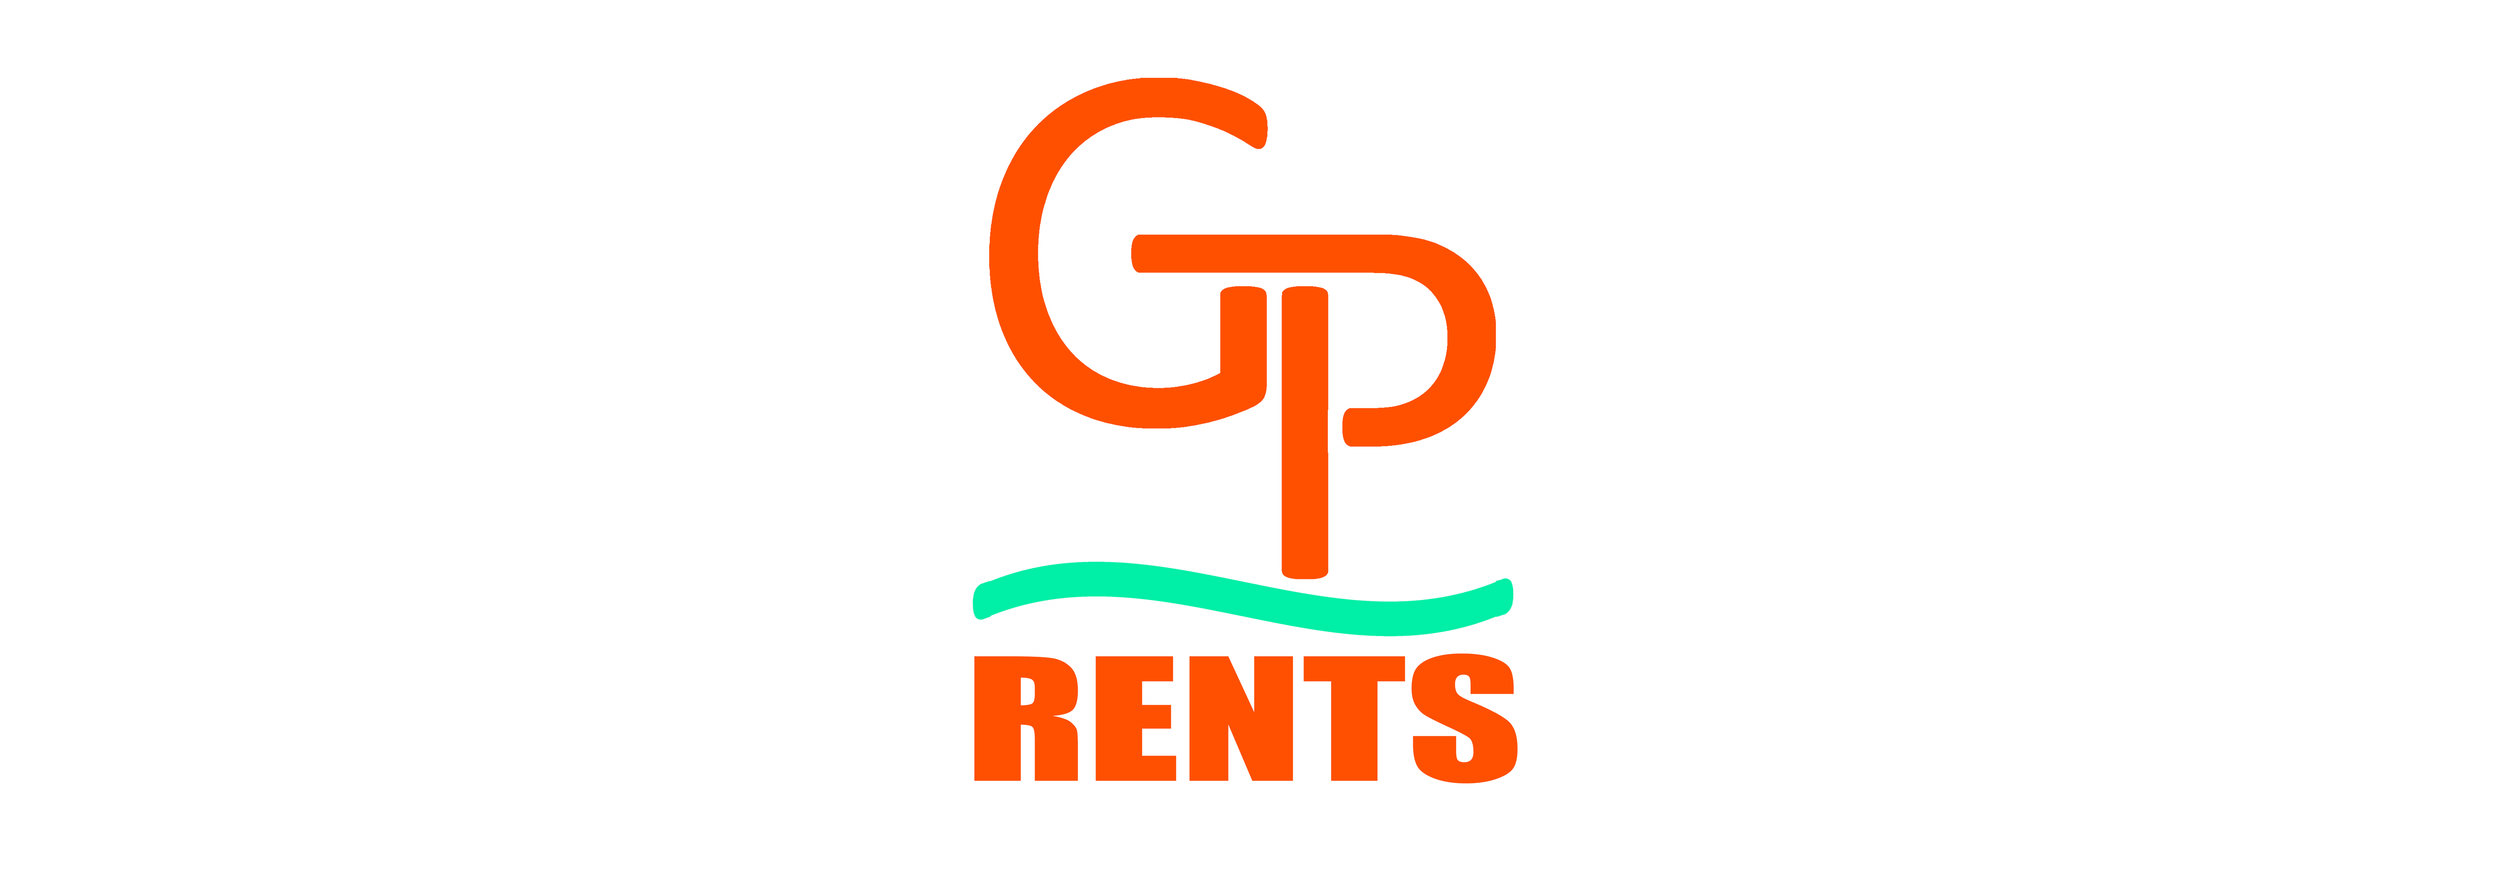 New GP Rents.jpg